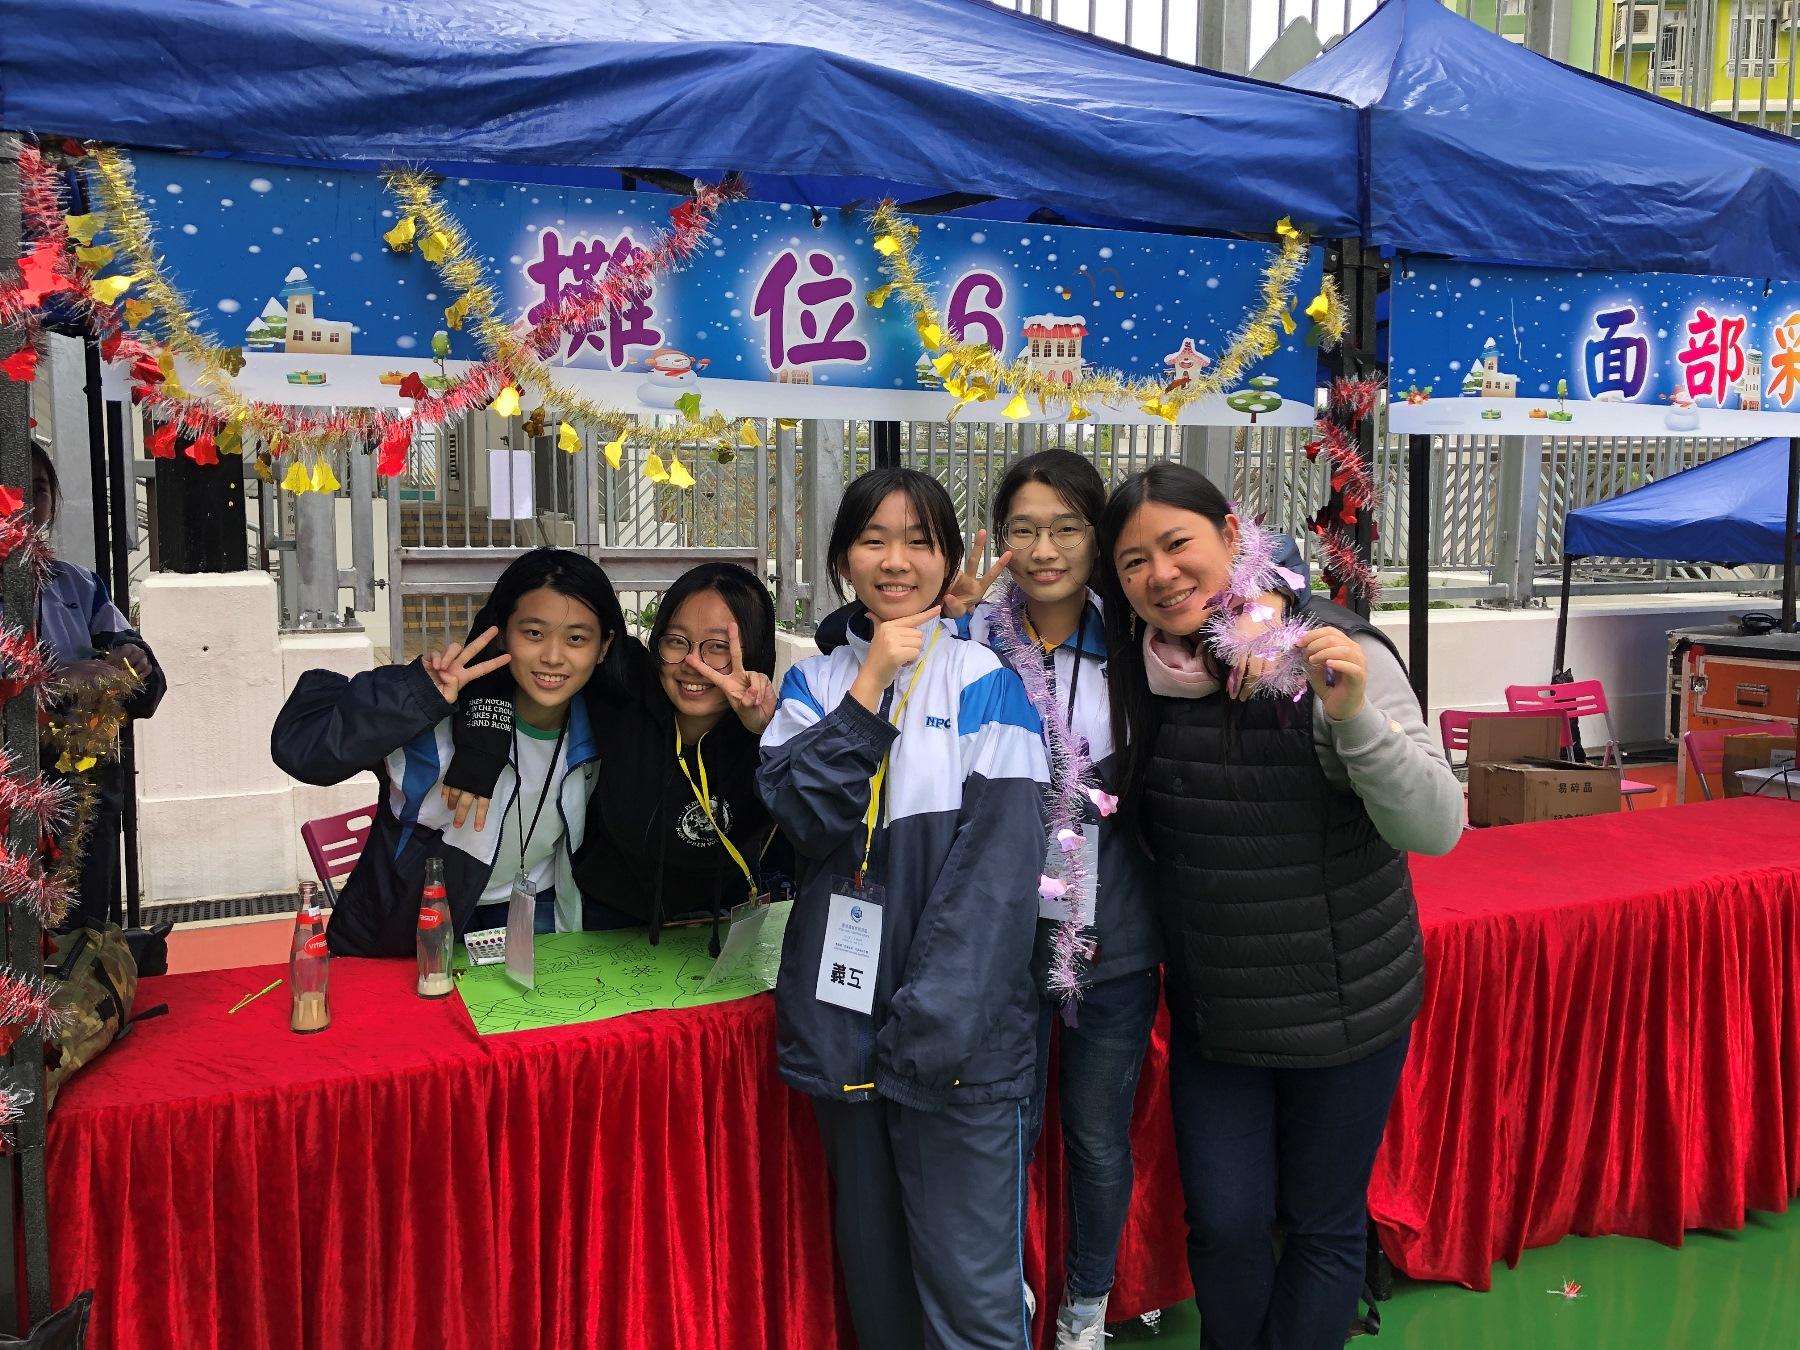 https://npc.edu.hk/sites/default/files/img_0813_1.jpg